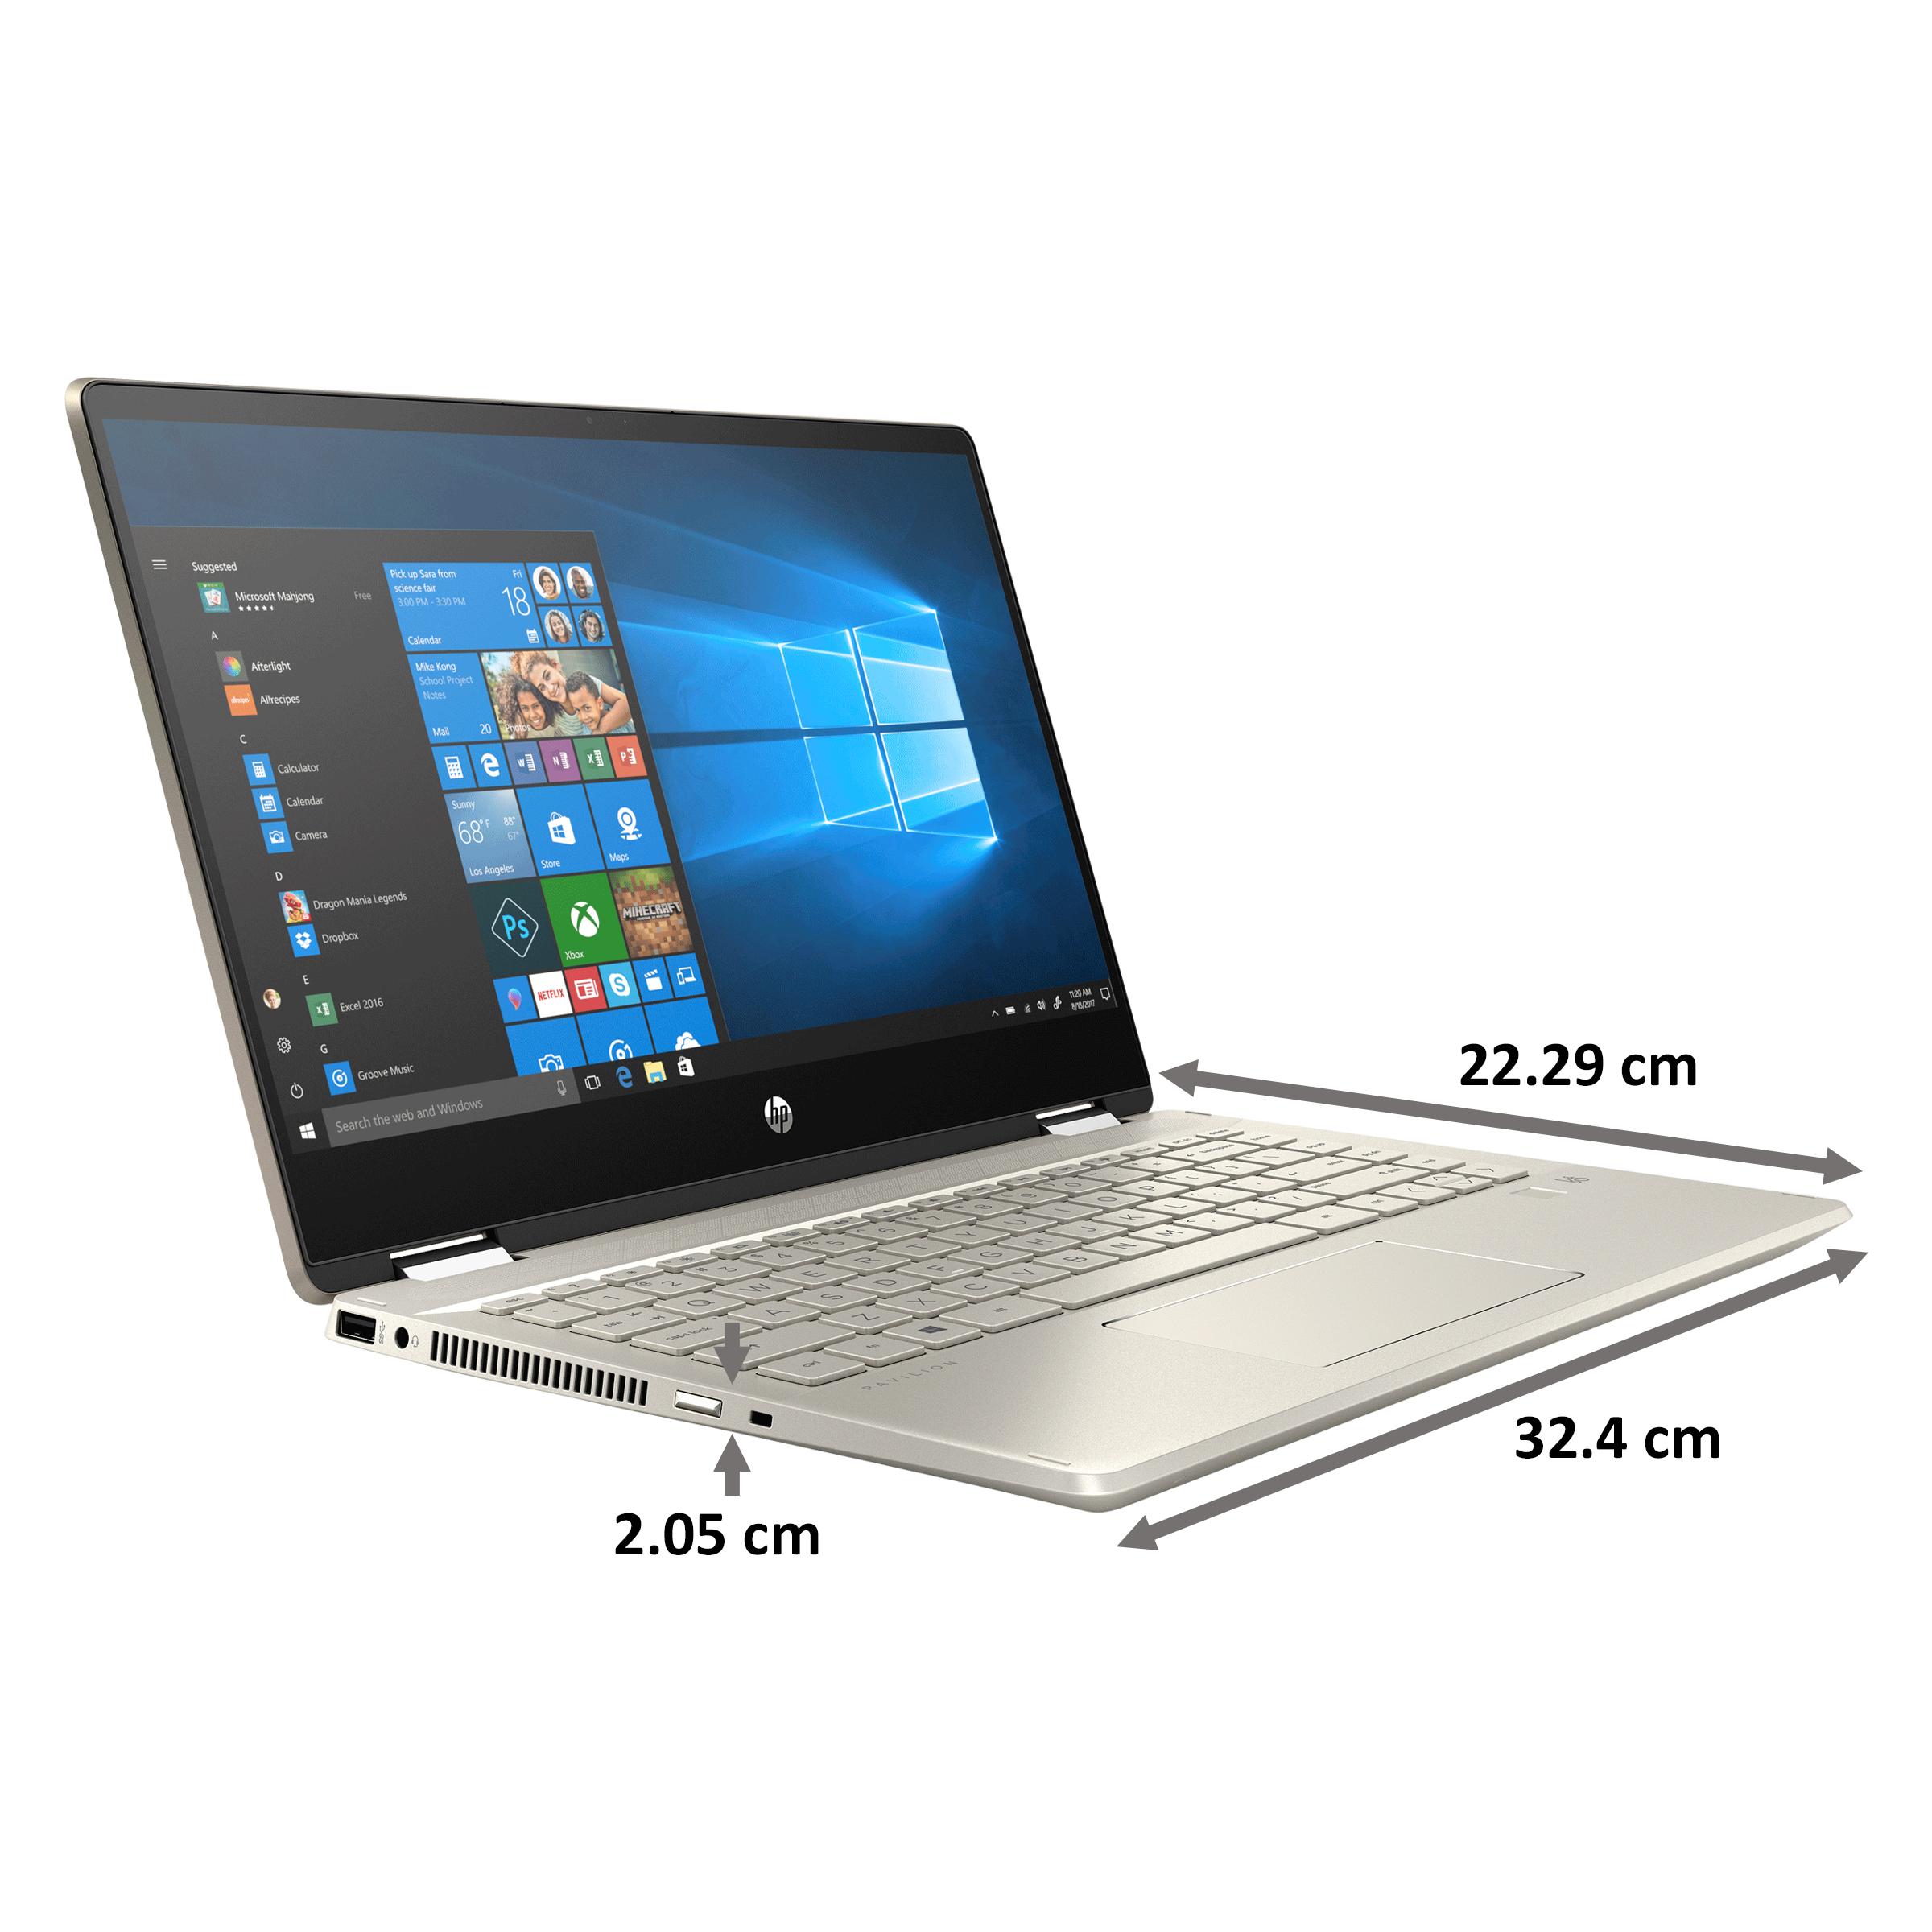 HP Pavilion x360 Convertible 14-dh1502TU (401S0PA#ACJ) Core i3 10th Gen Windows 10 Home 2-in-1 Laptop (8GB RAM, 512GB SSD, Intel UHD Graphics, MS Office, 35.56cm, Warm Gold)_2